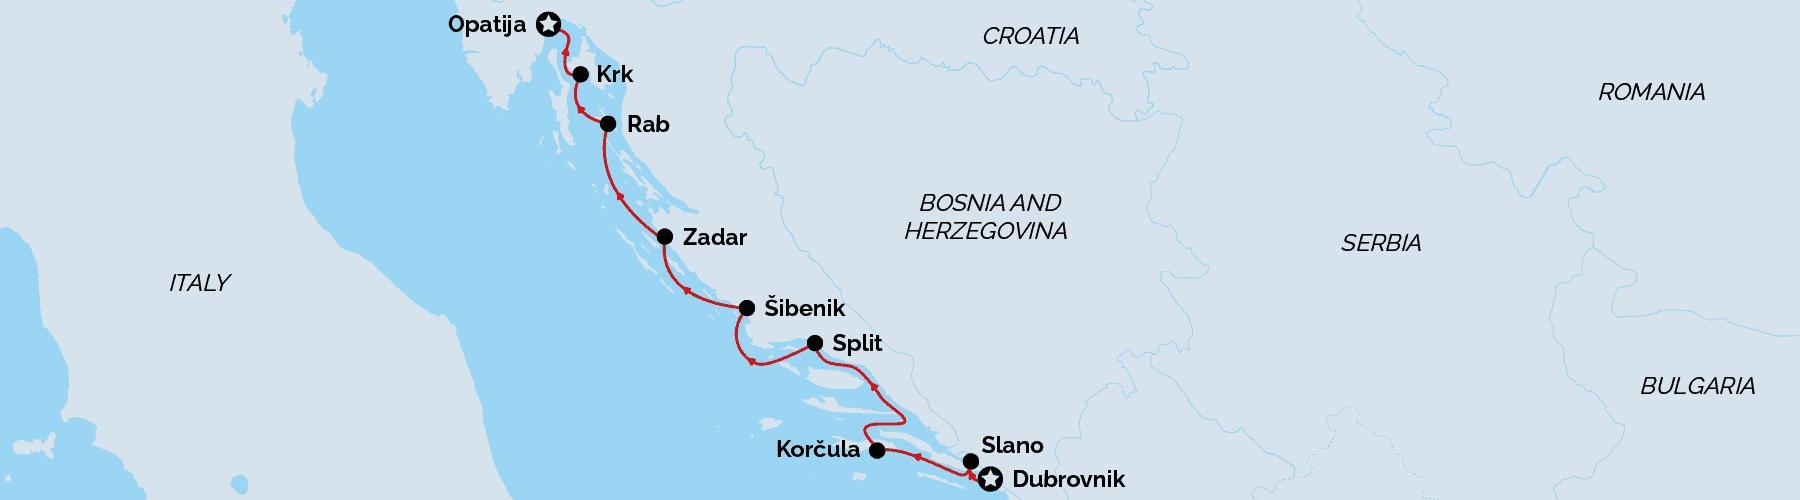 Dubrovnik to Opatija Signature Cruise